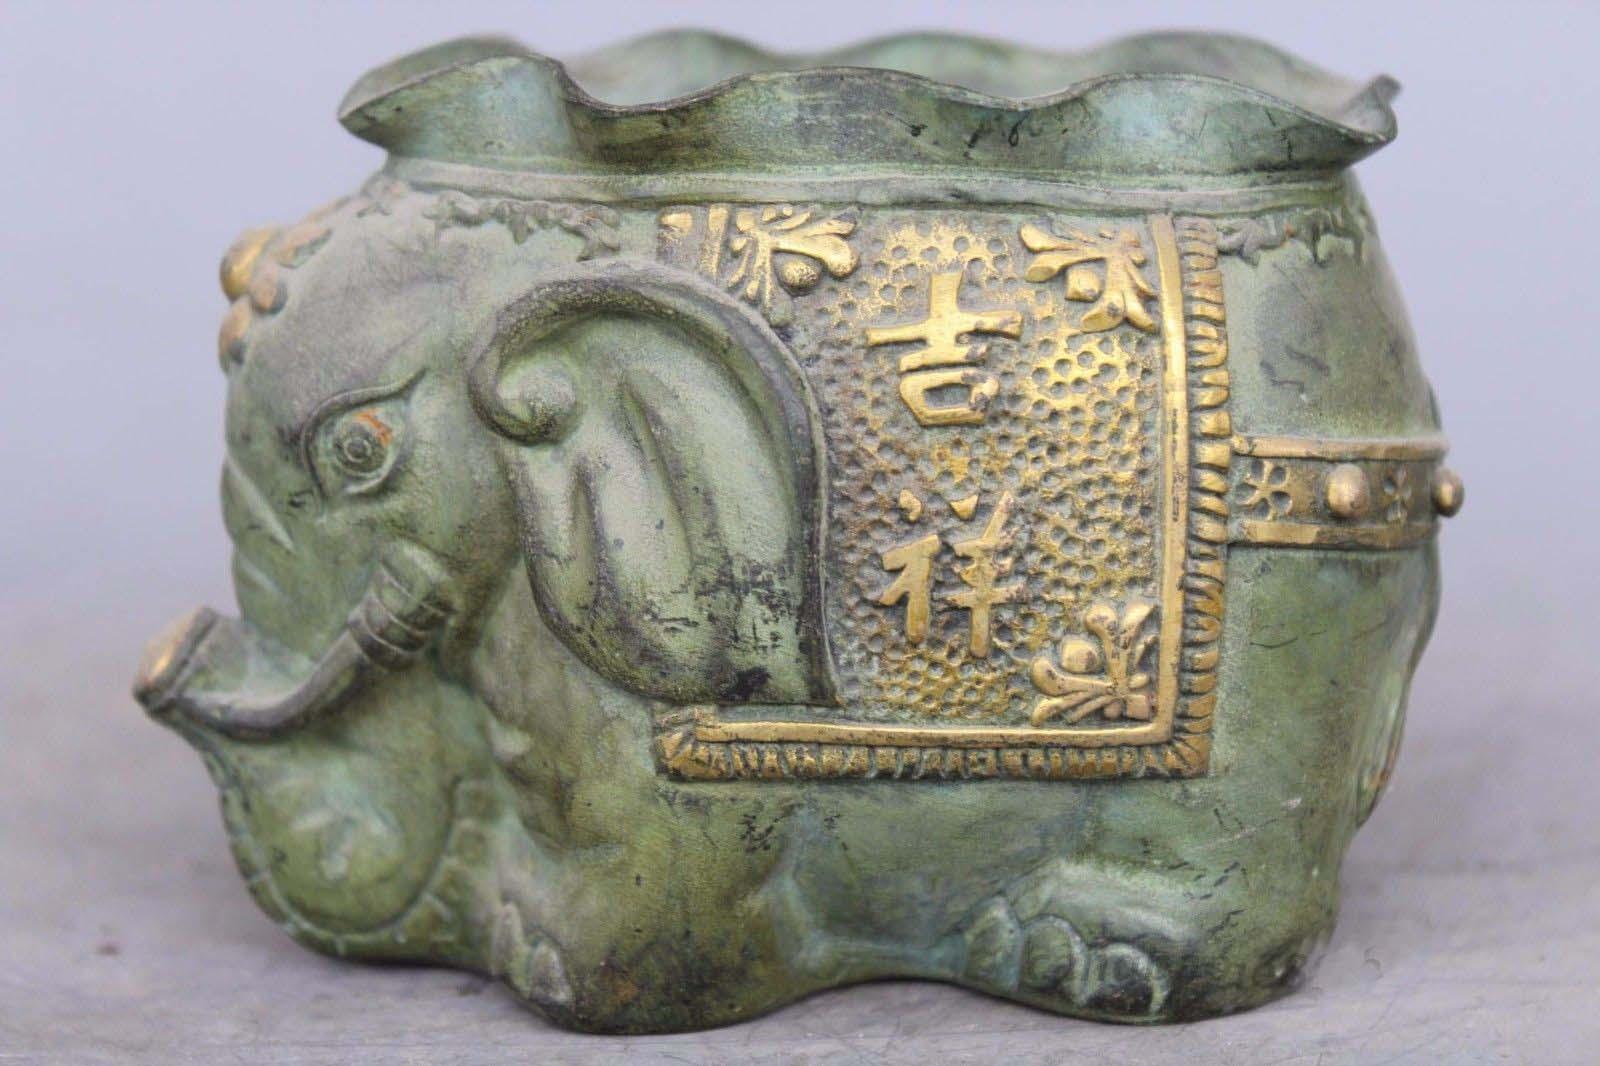 Marked Chinese Feng Shui Bronze Gilt Elephant Auspicious Lucky Pot Jar CrockMarked Chinese Feng Shui Bronze Gilt Elephant Auspicious Lucky Pot Jar Crock